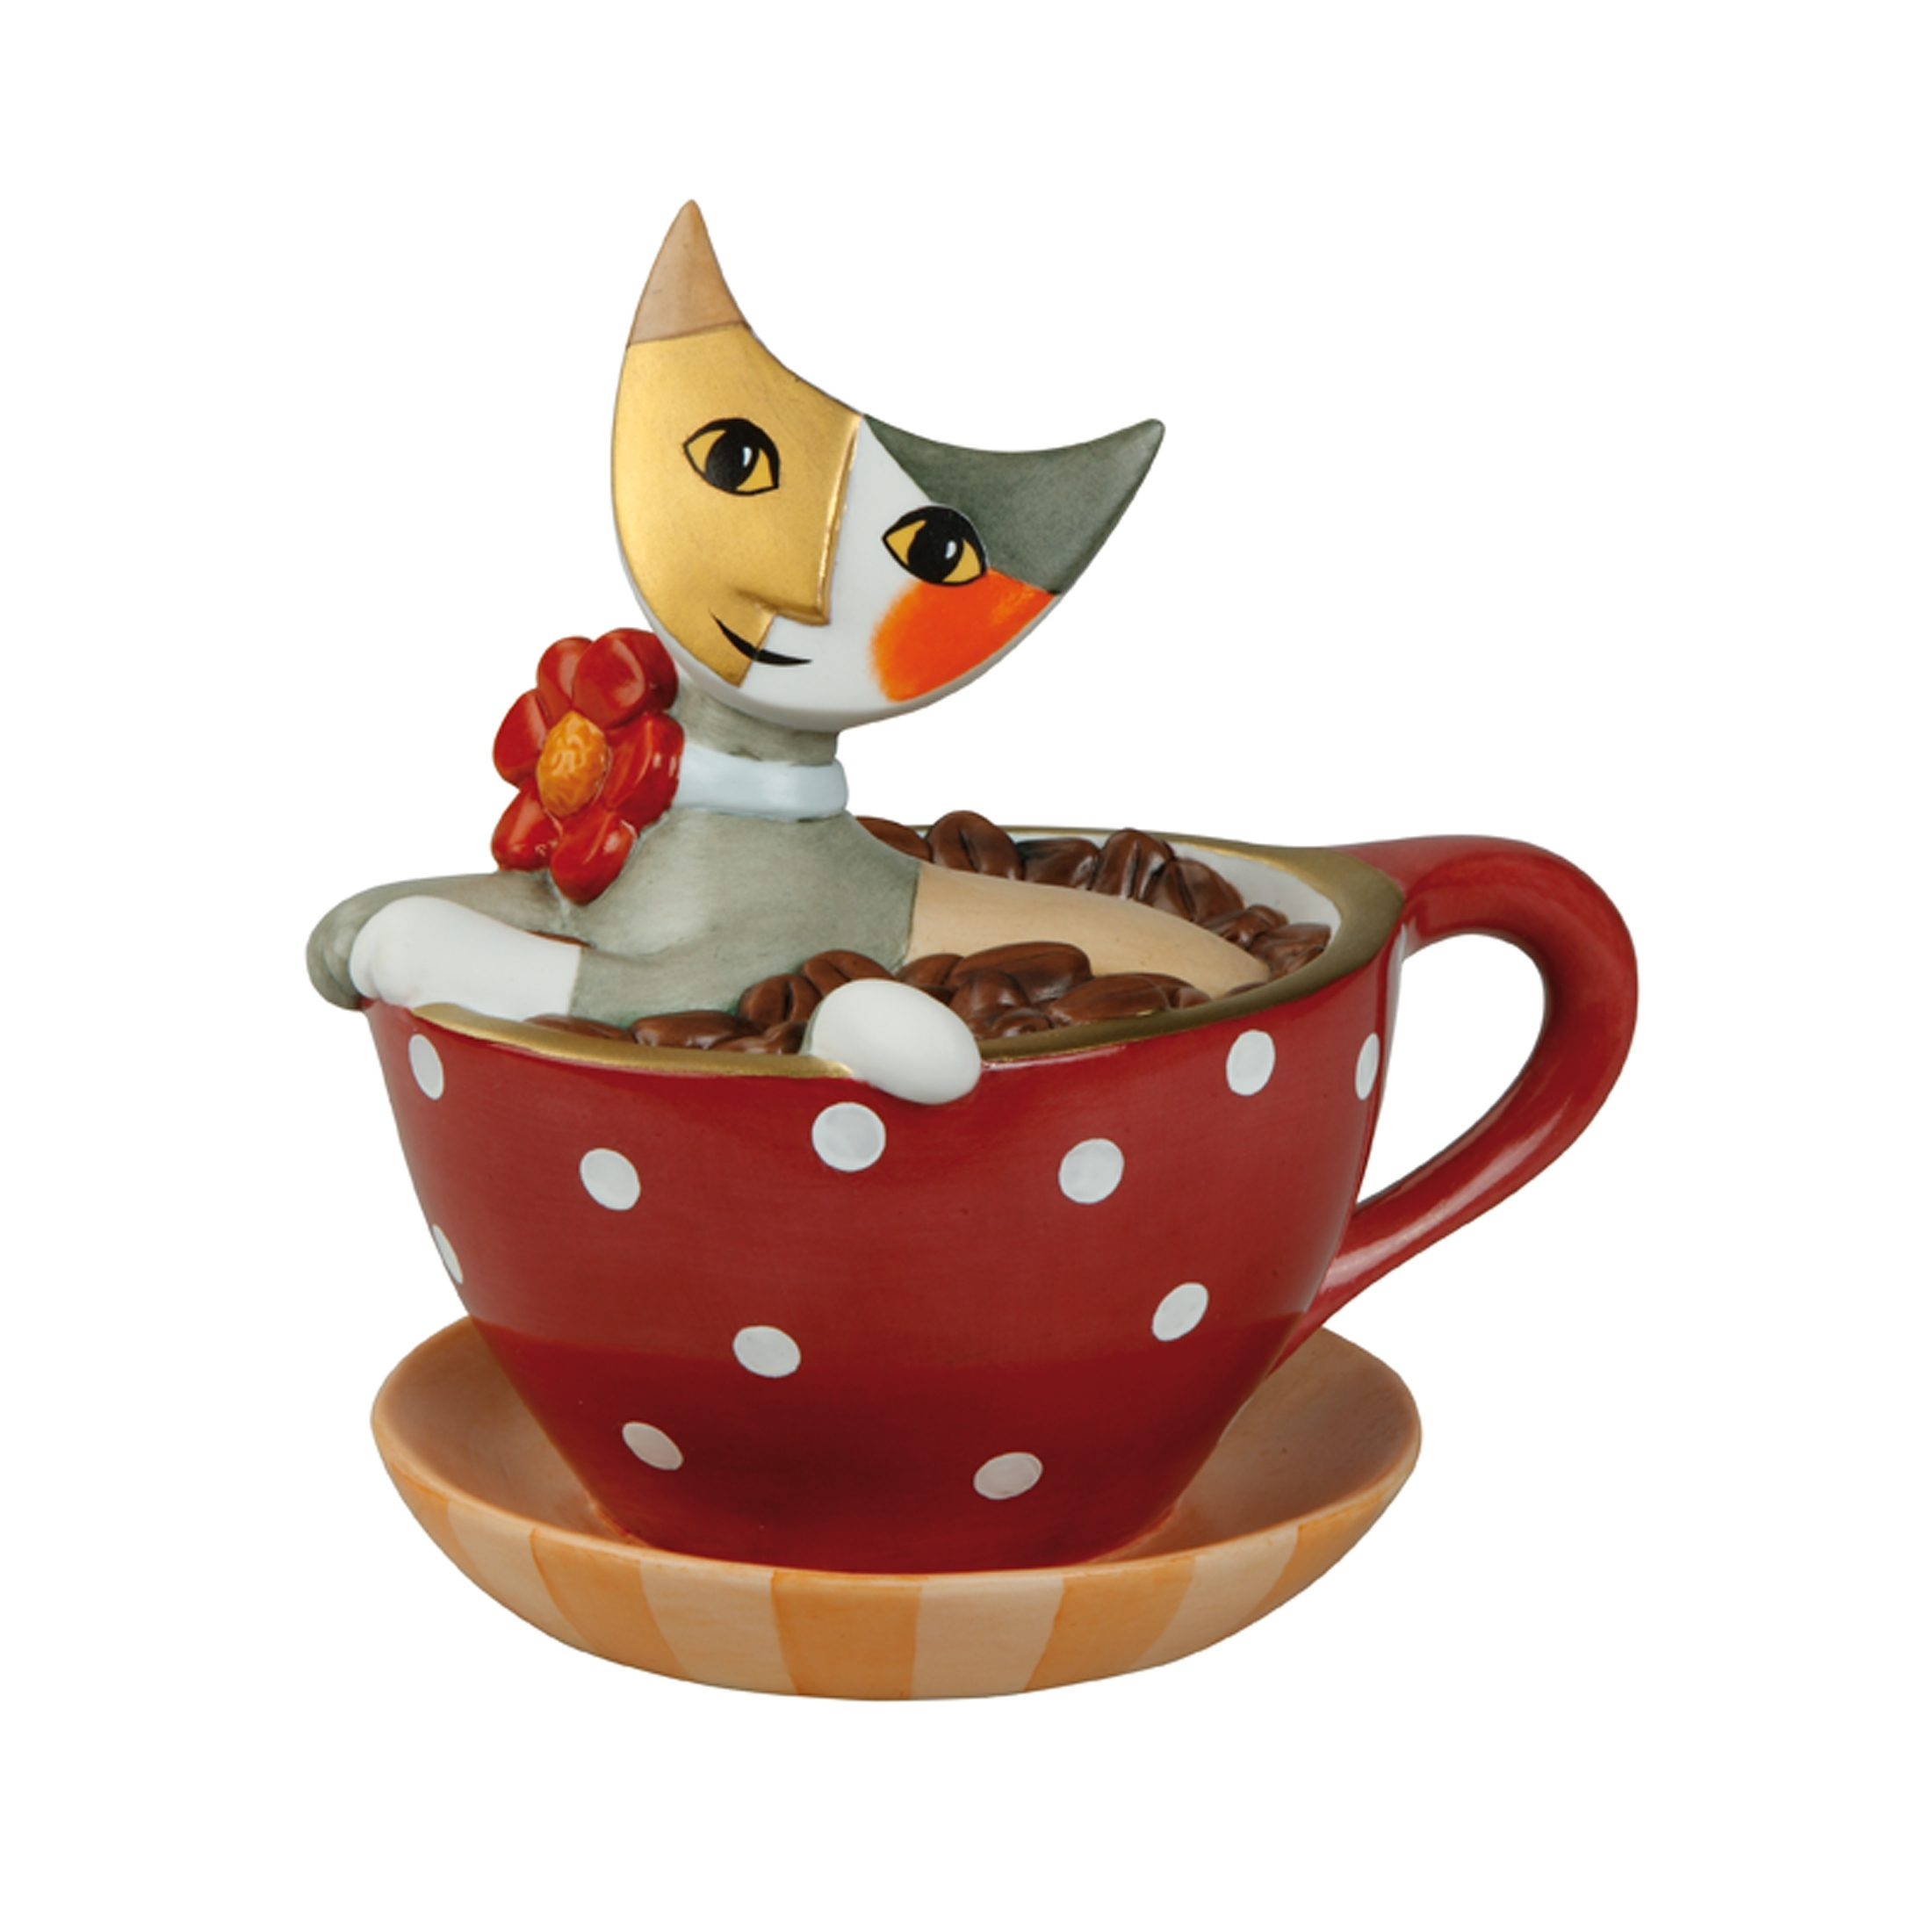 Goebel Pausa caffeè - Spardose »Rosina Wachtmeister«